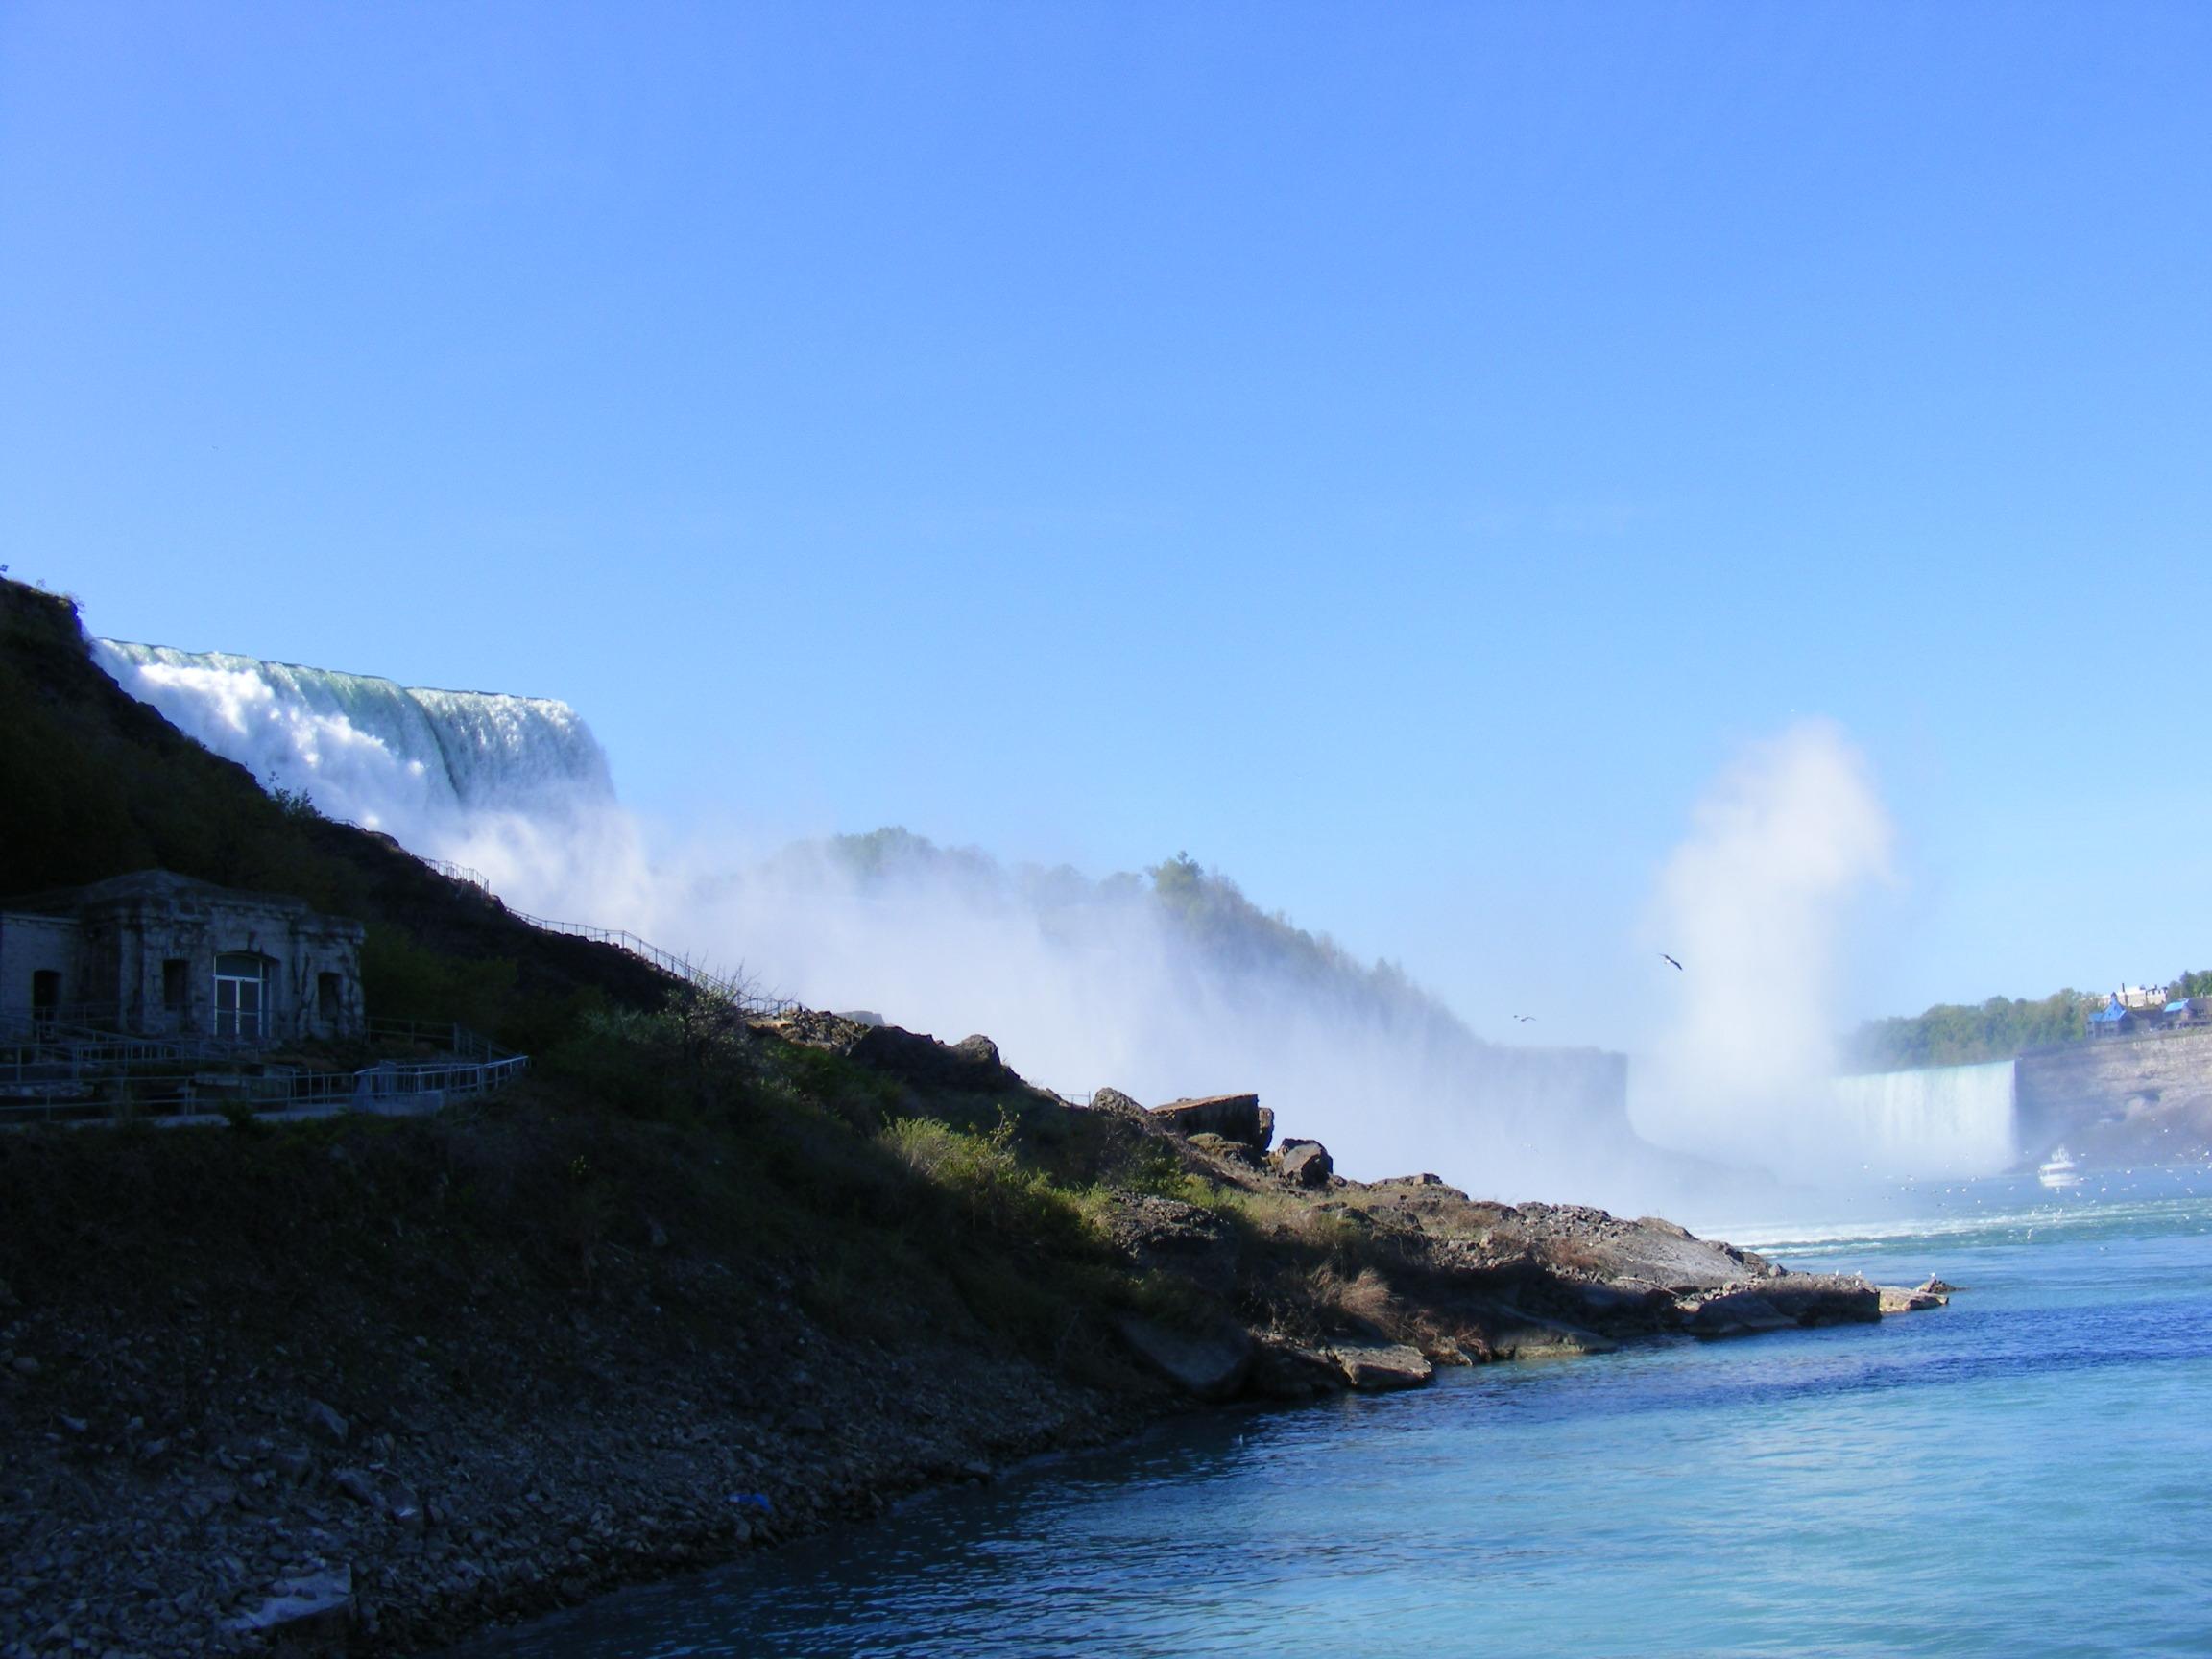 Beauty of Niagara Falls, Rushing, Niagara, Park, Plants, HQ Photo